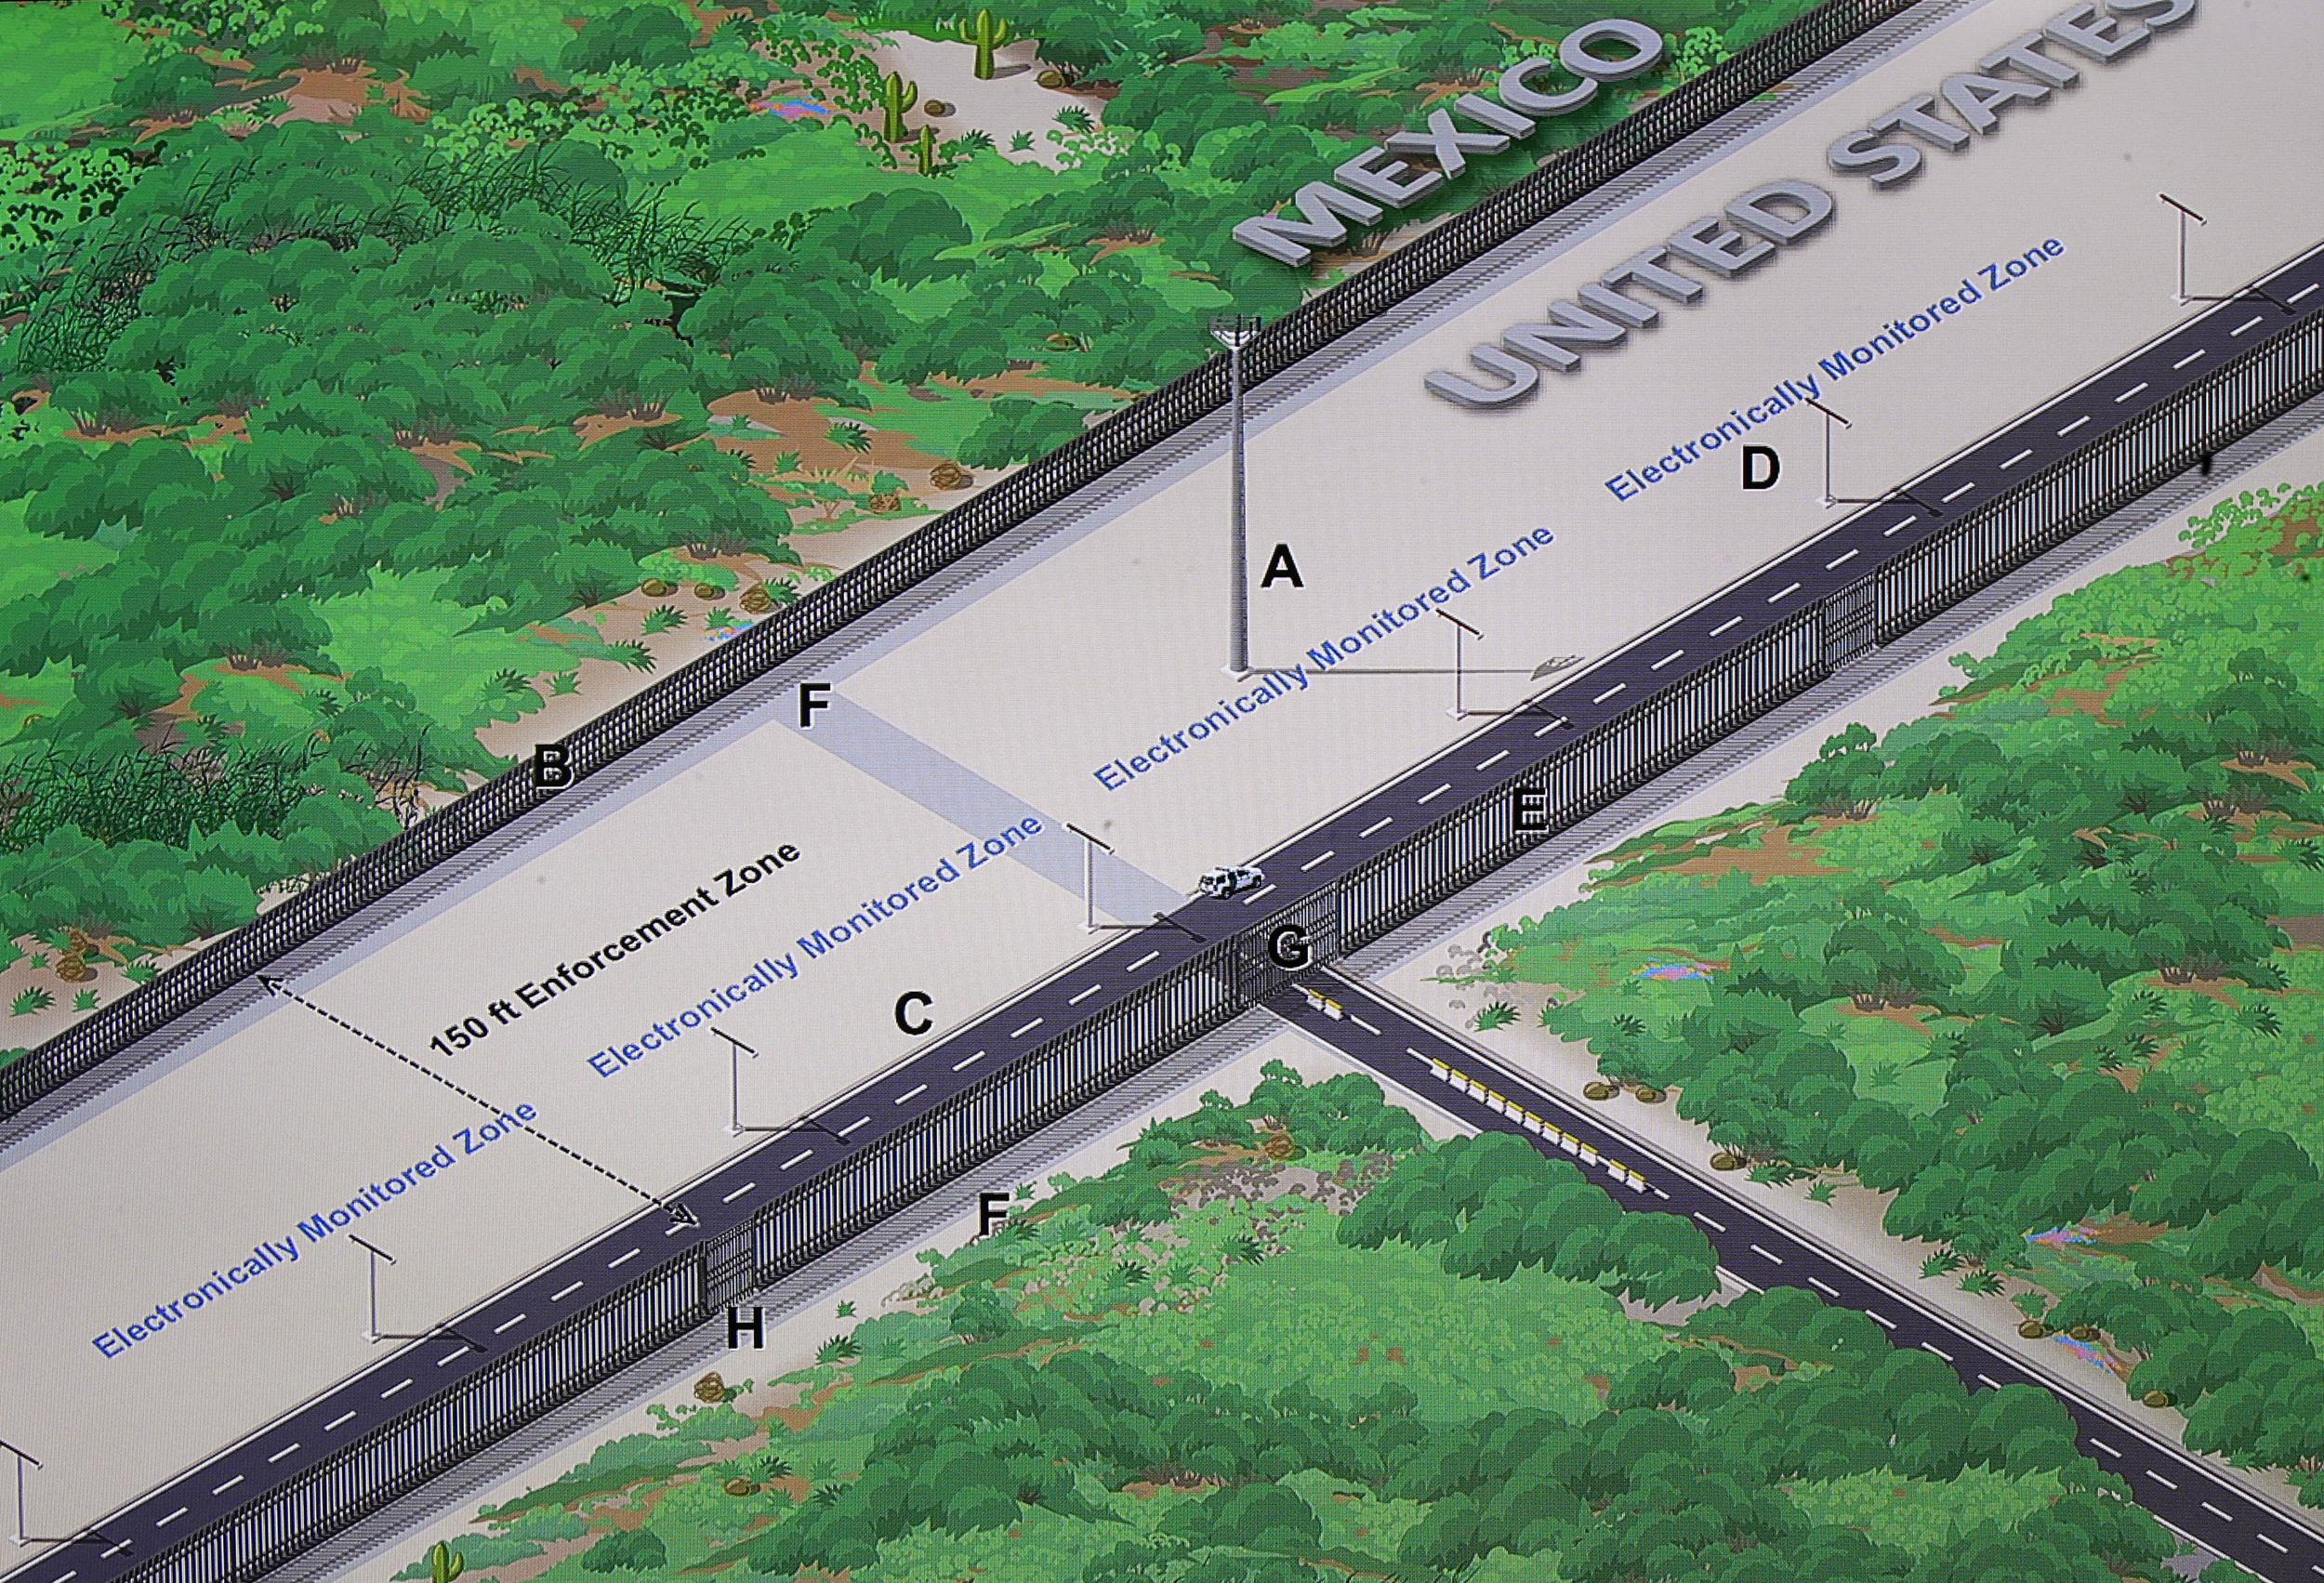 Image: A concept illustration of a U.S.-Mexico border enforcement zone